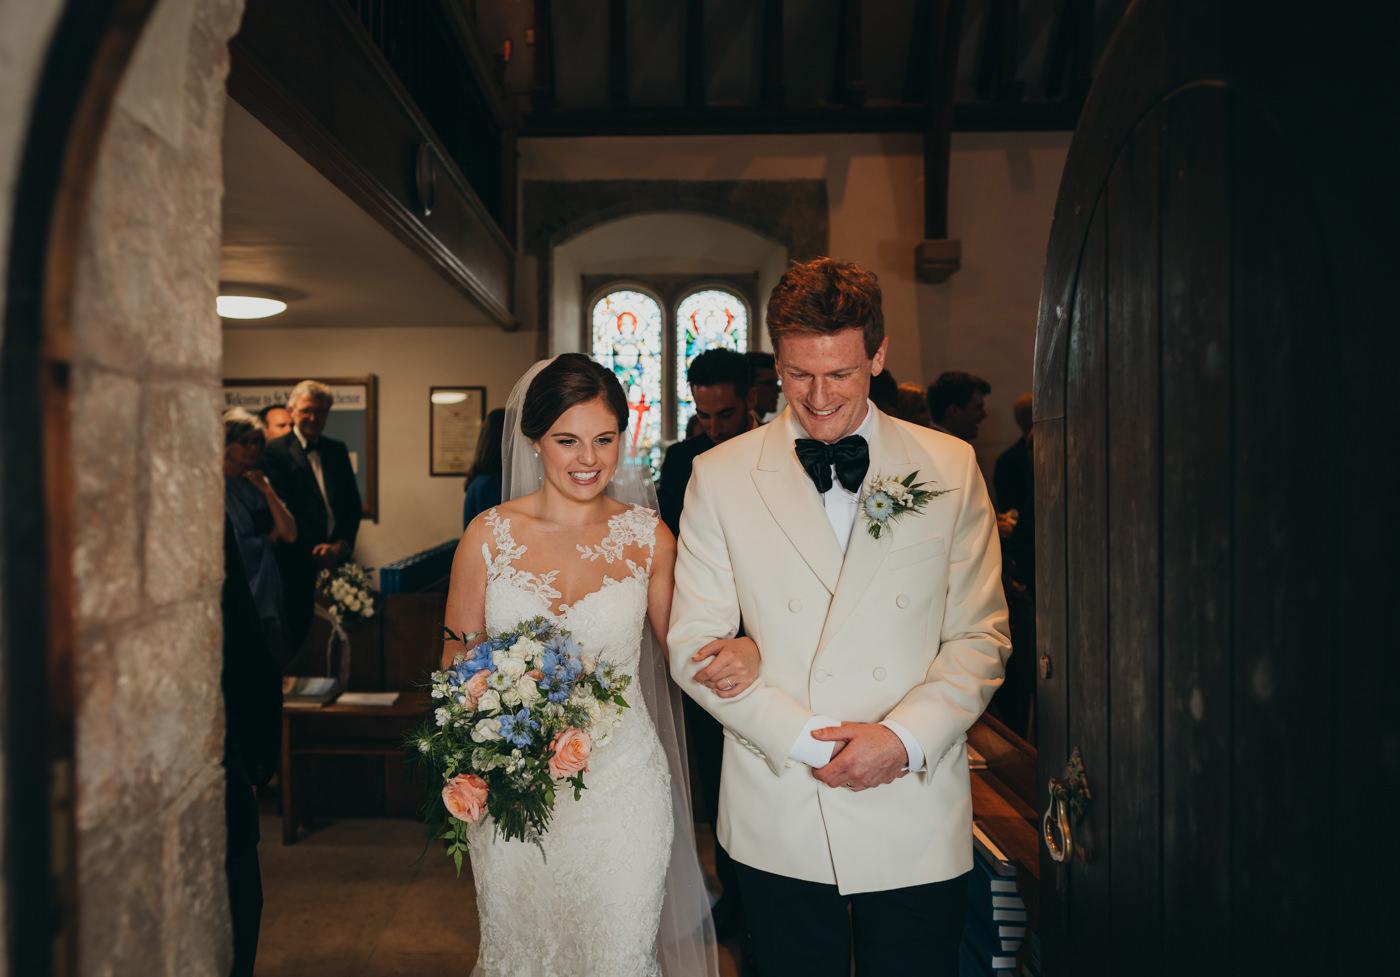 Itchenor Wedding Photographer